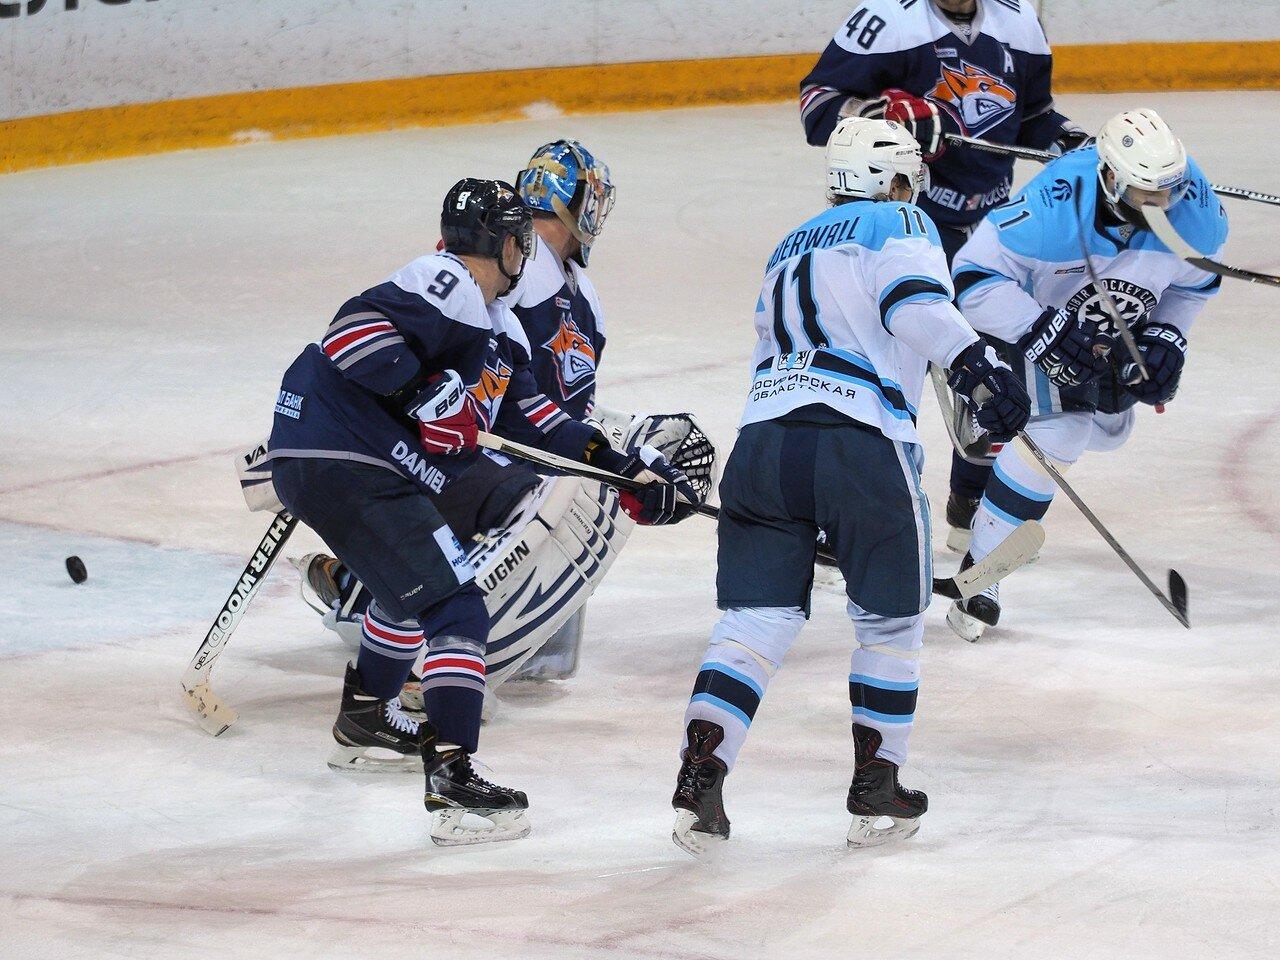 97Плей-офф 2016 Восток 1/2 Металлург - Сибирь 10.03.2016